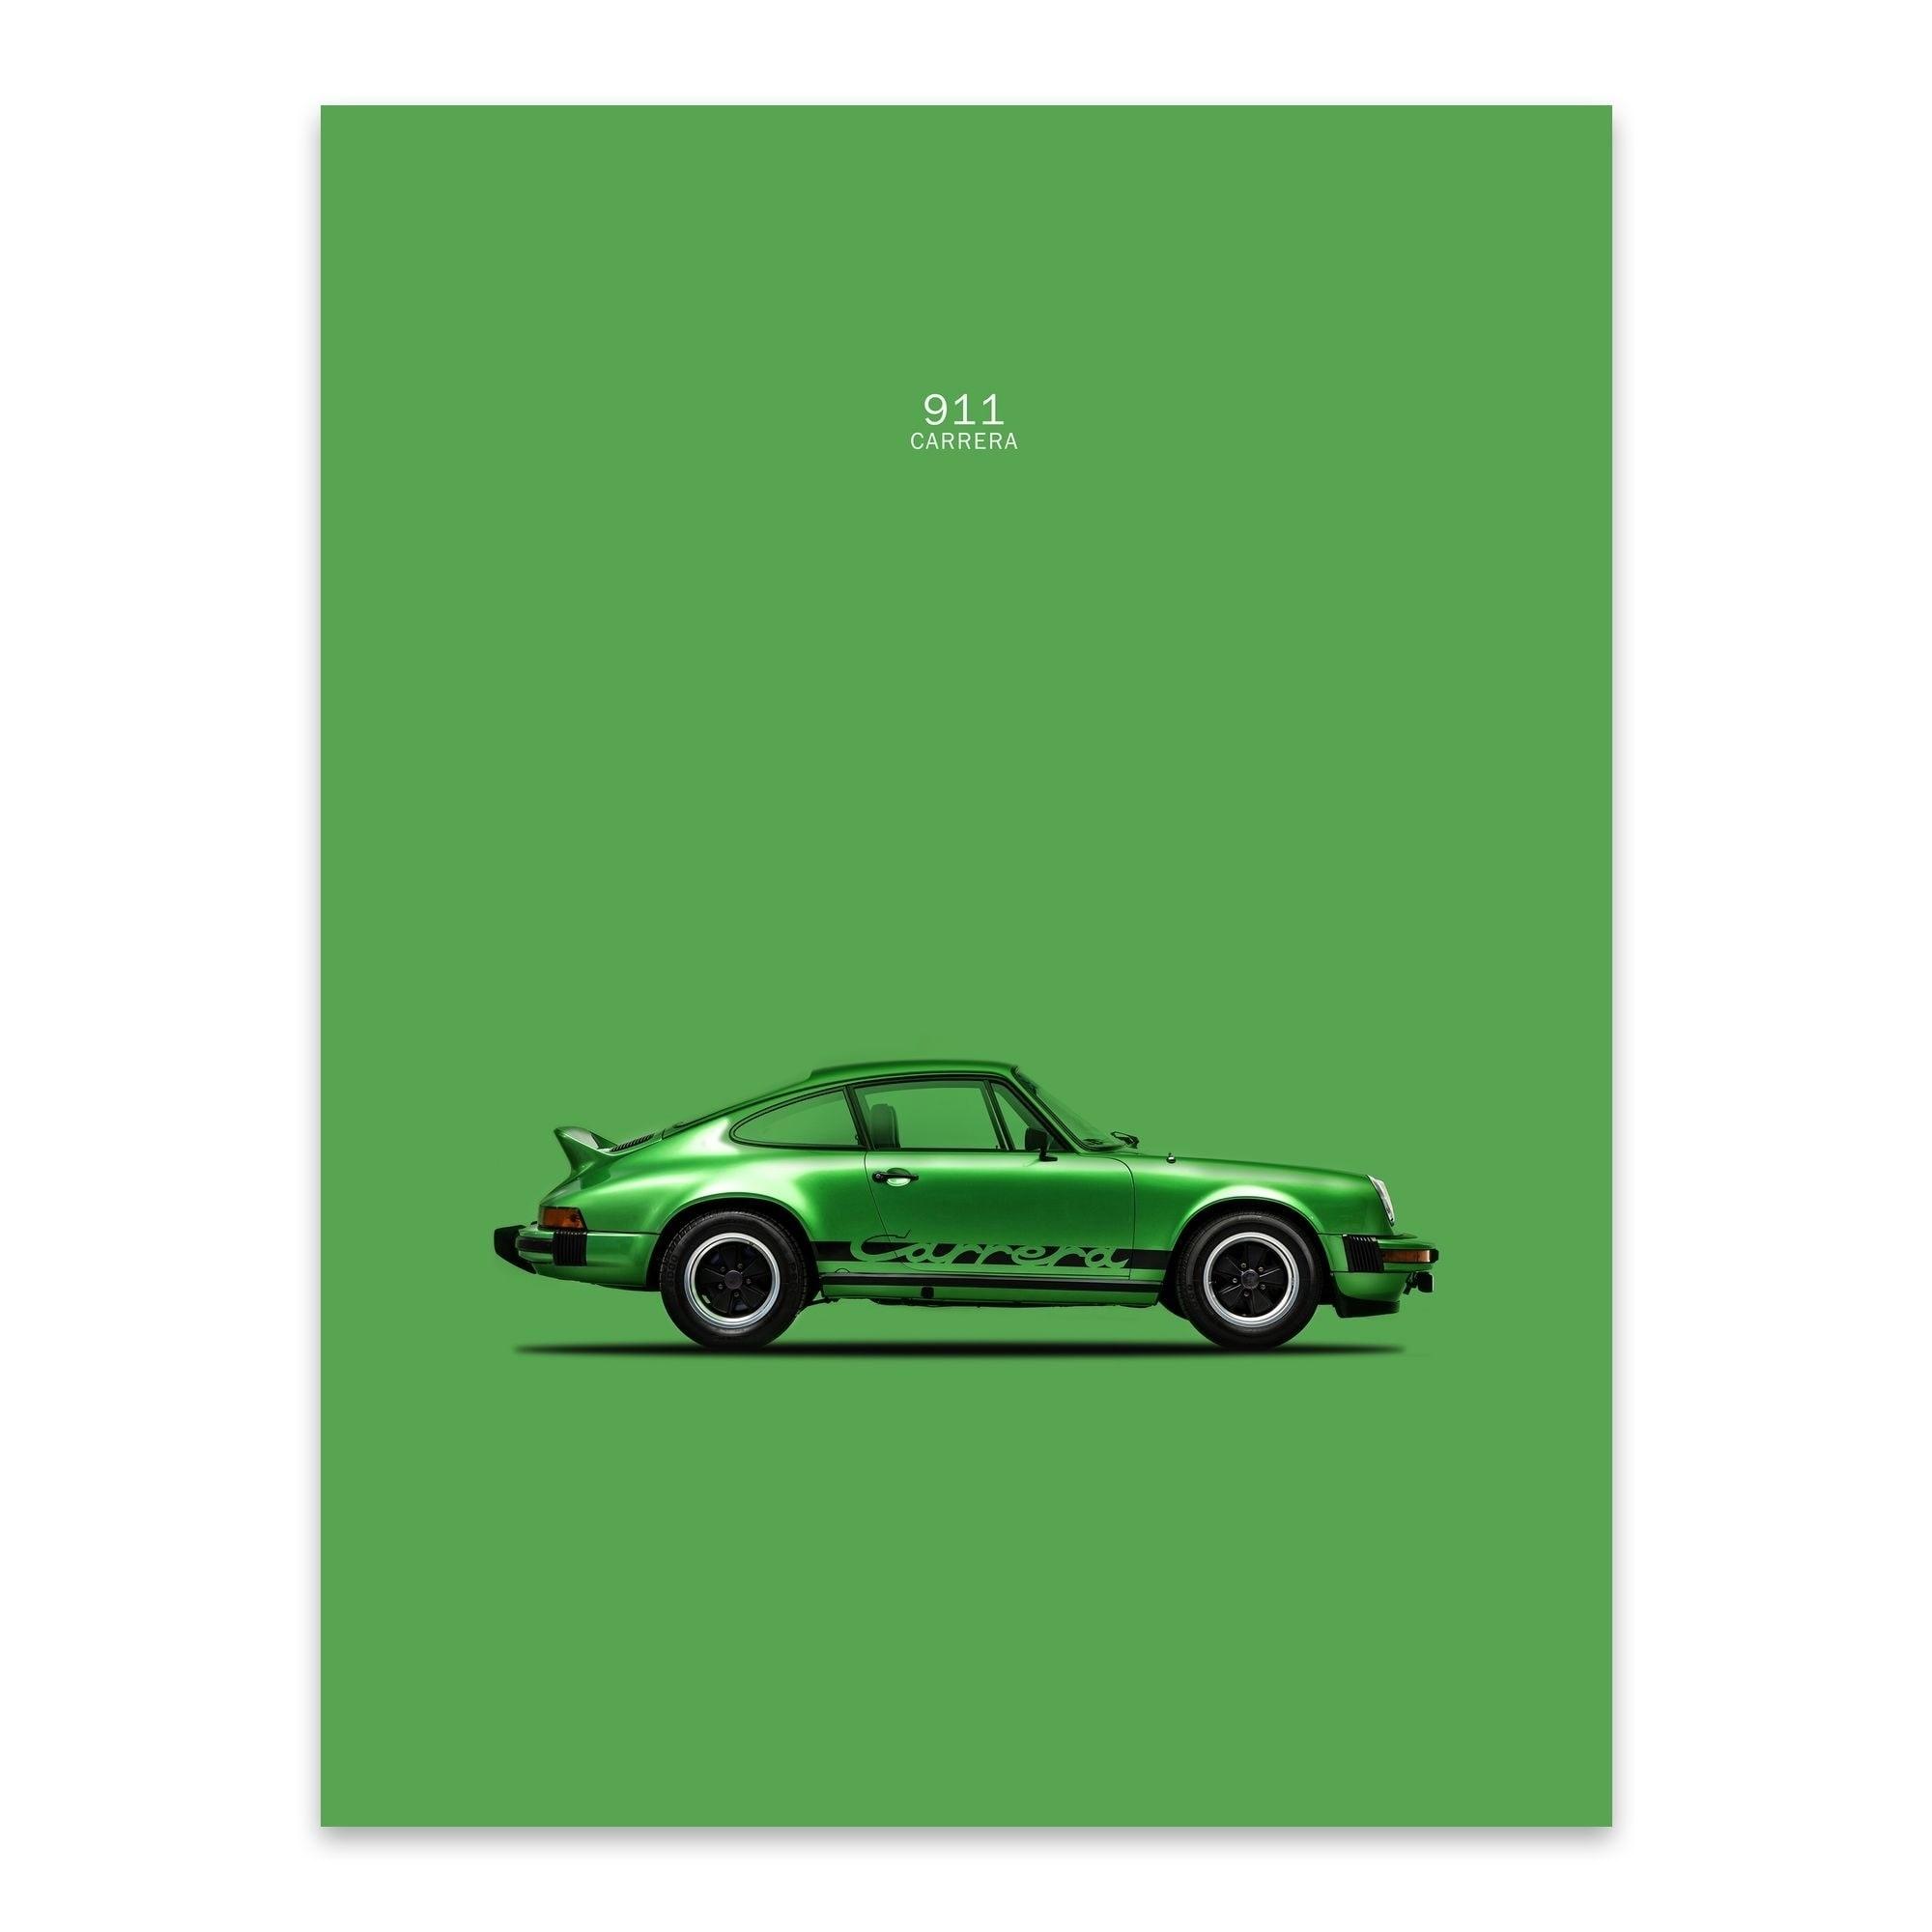 "Porshe Sports car poster wall art home decor photo print 24x24/"" inches"